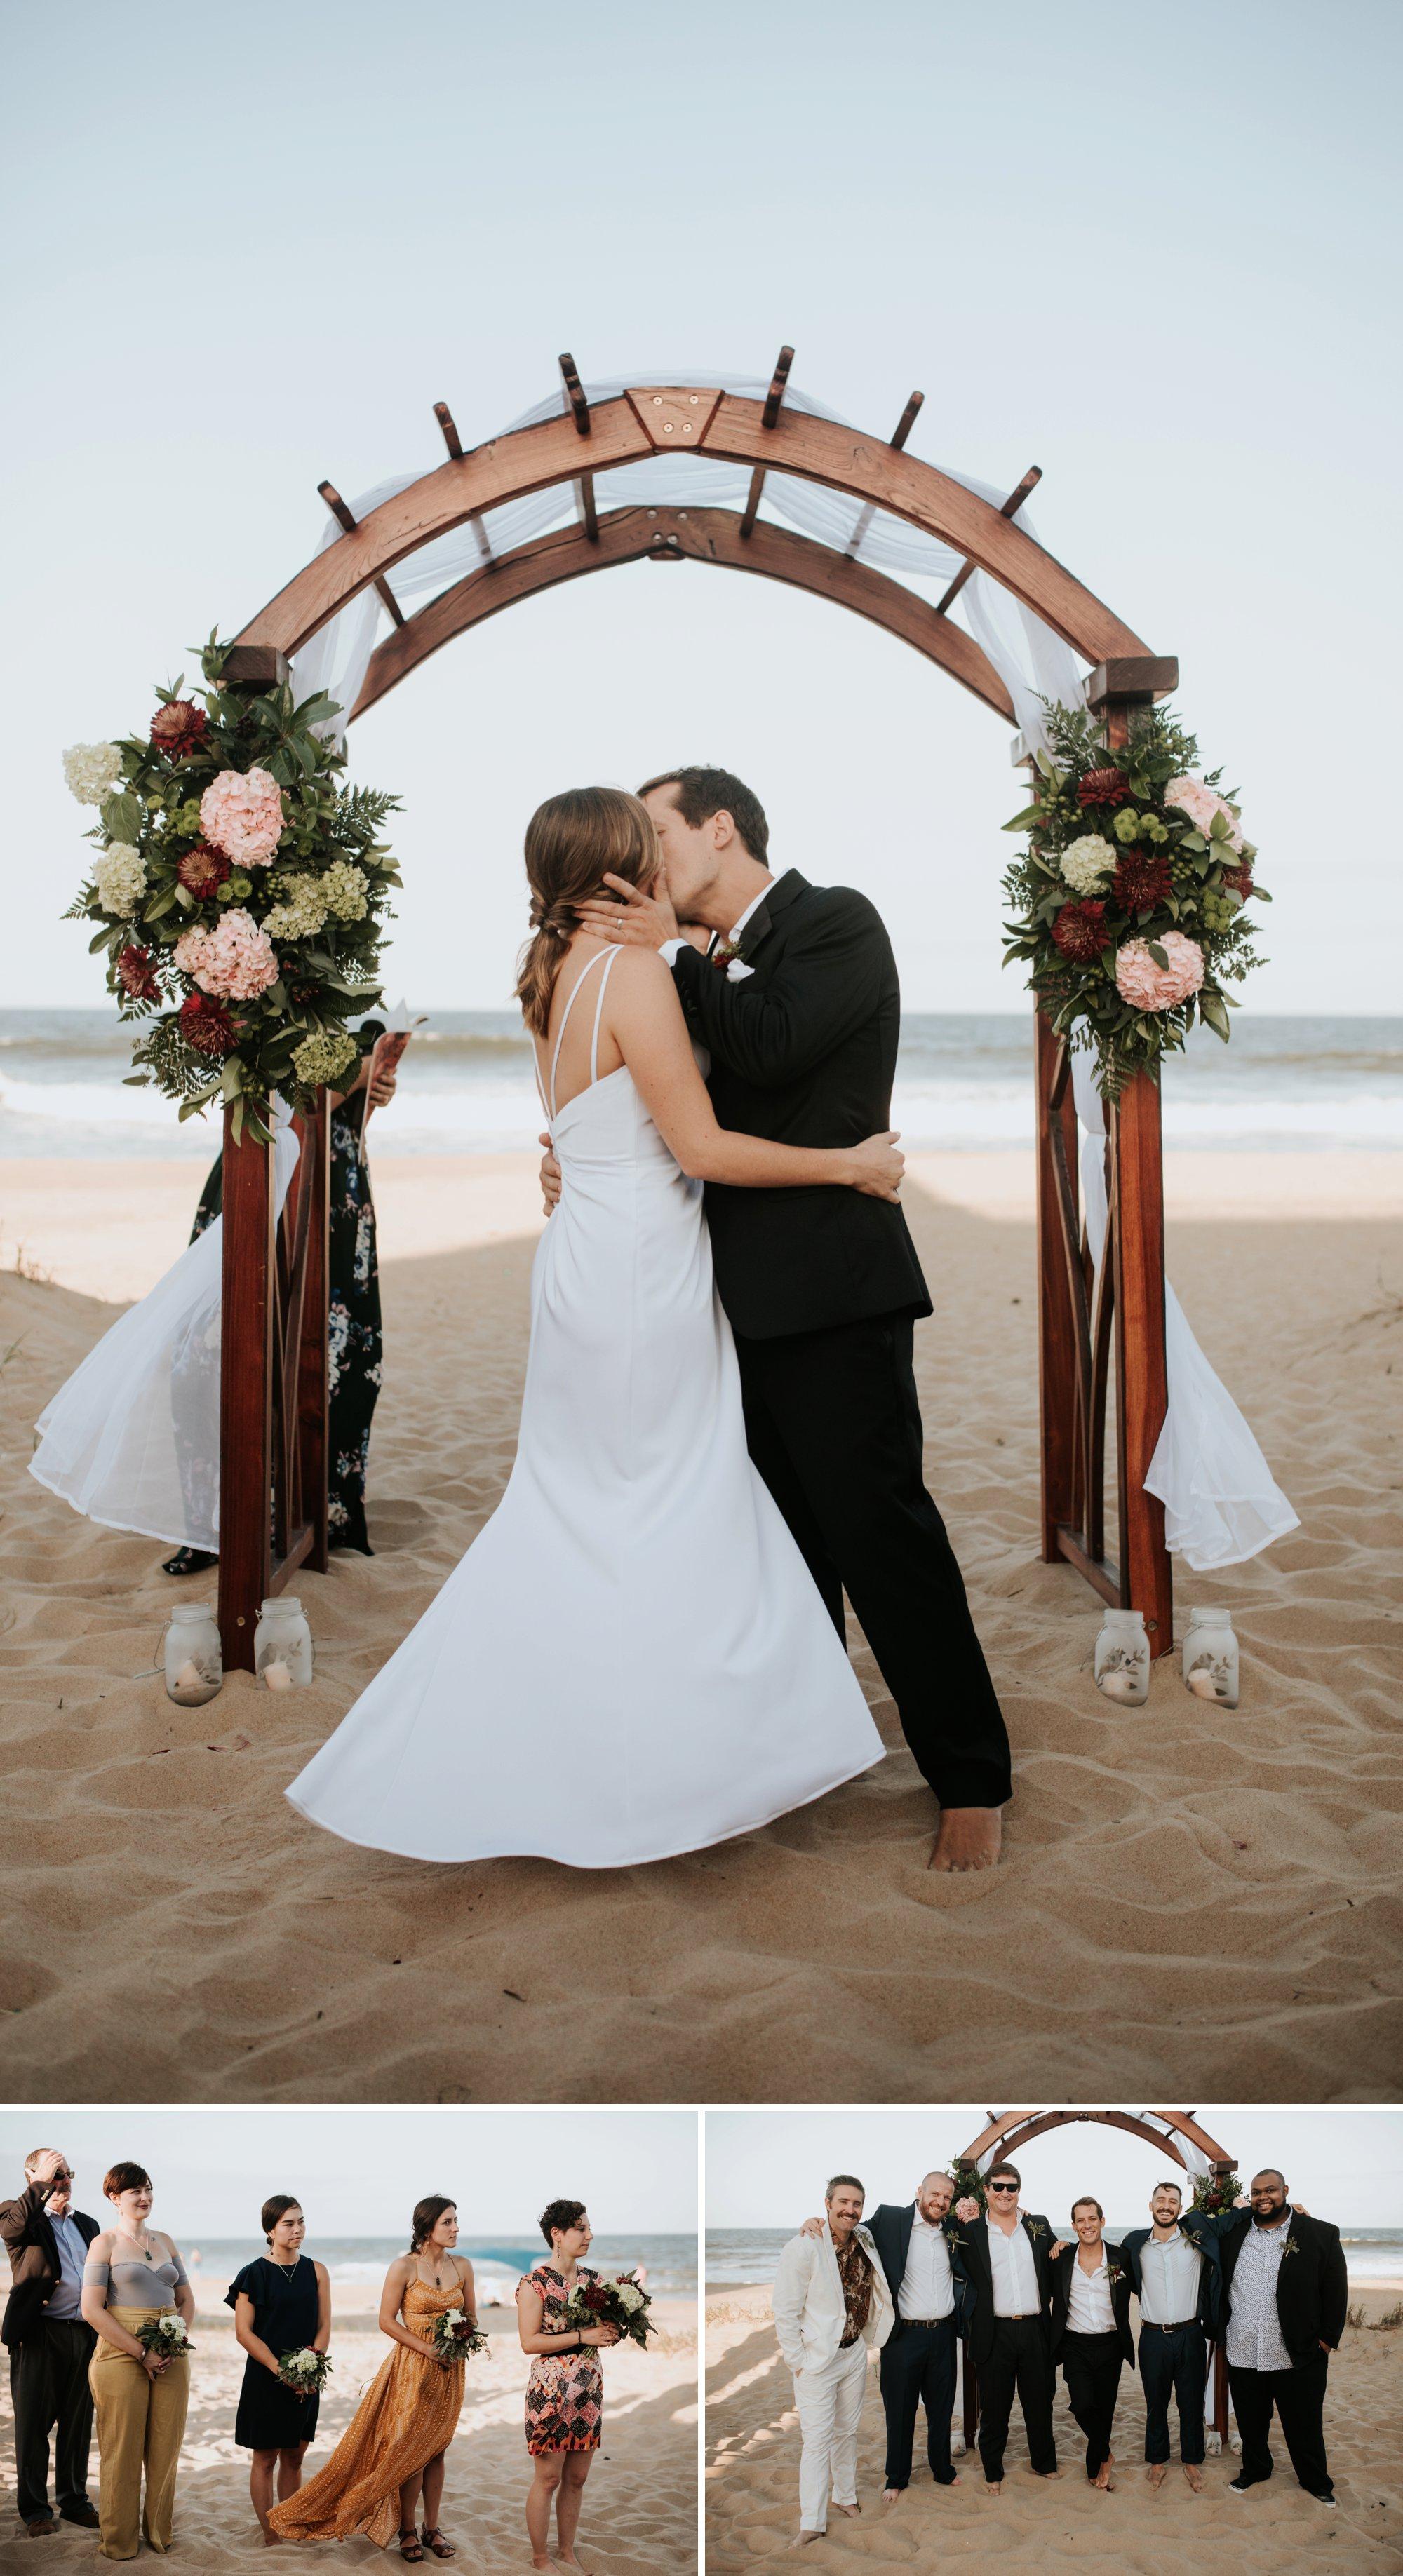 Low key backyard beach wedding in Sandbridge, VA kiss